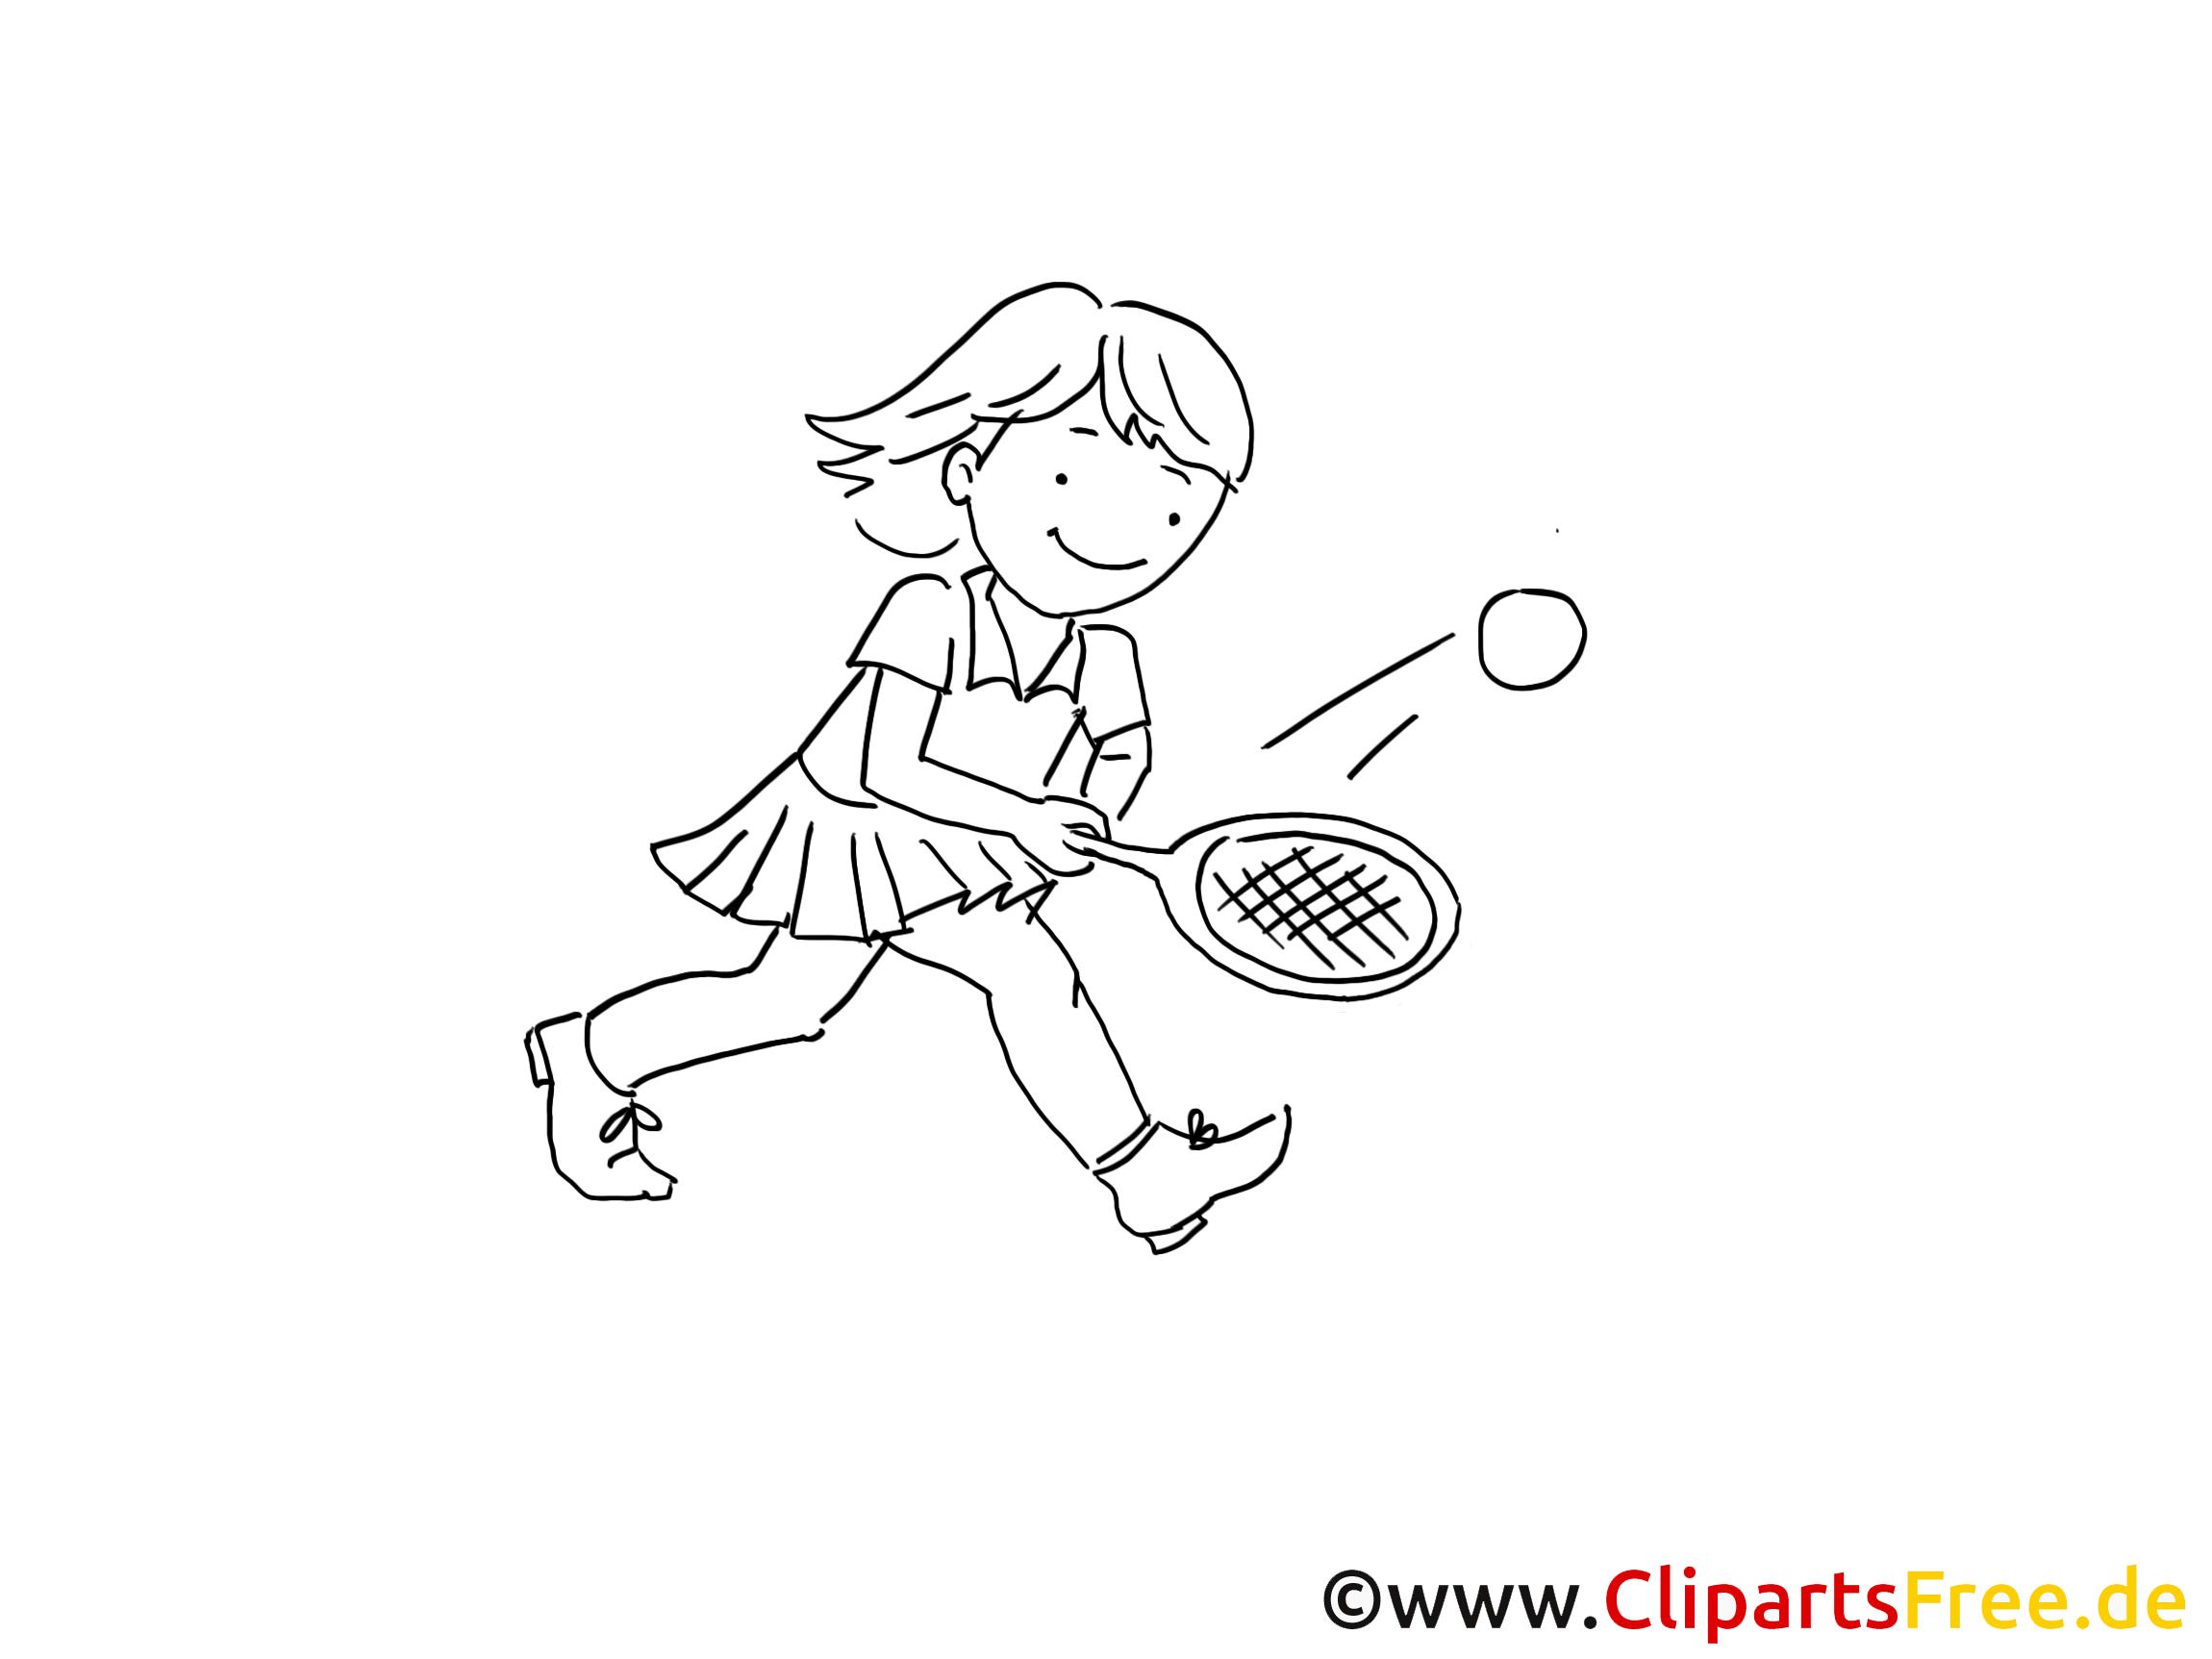 Tennis clip arts à imprimer - Fille illustrations